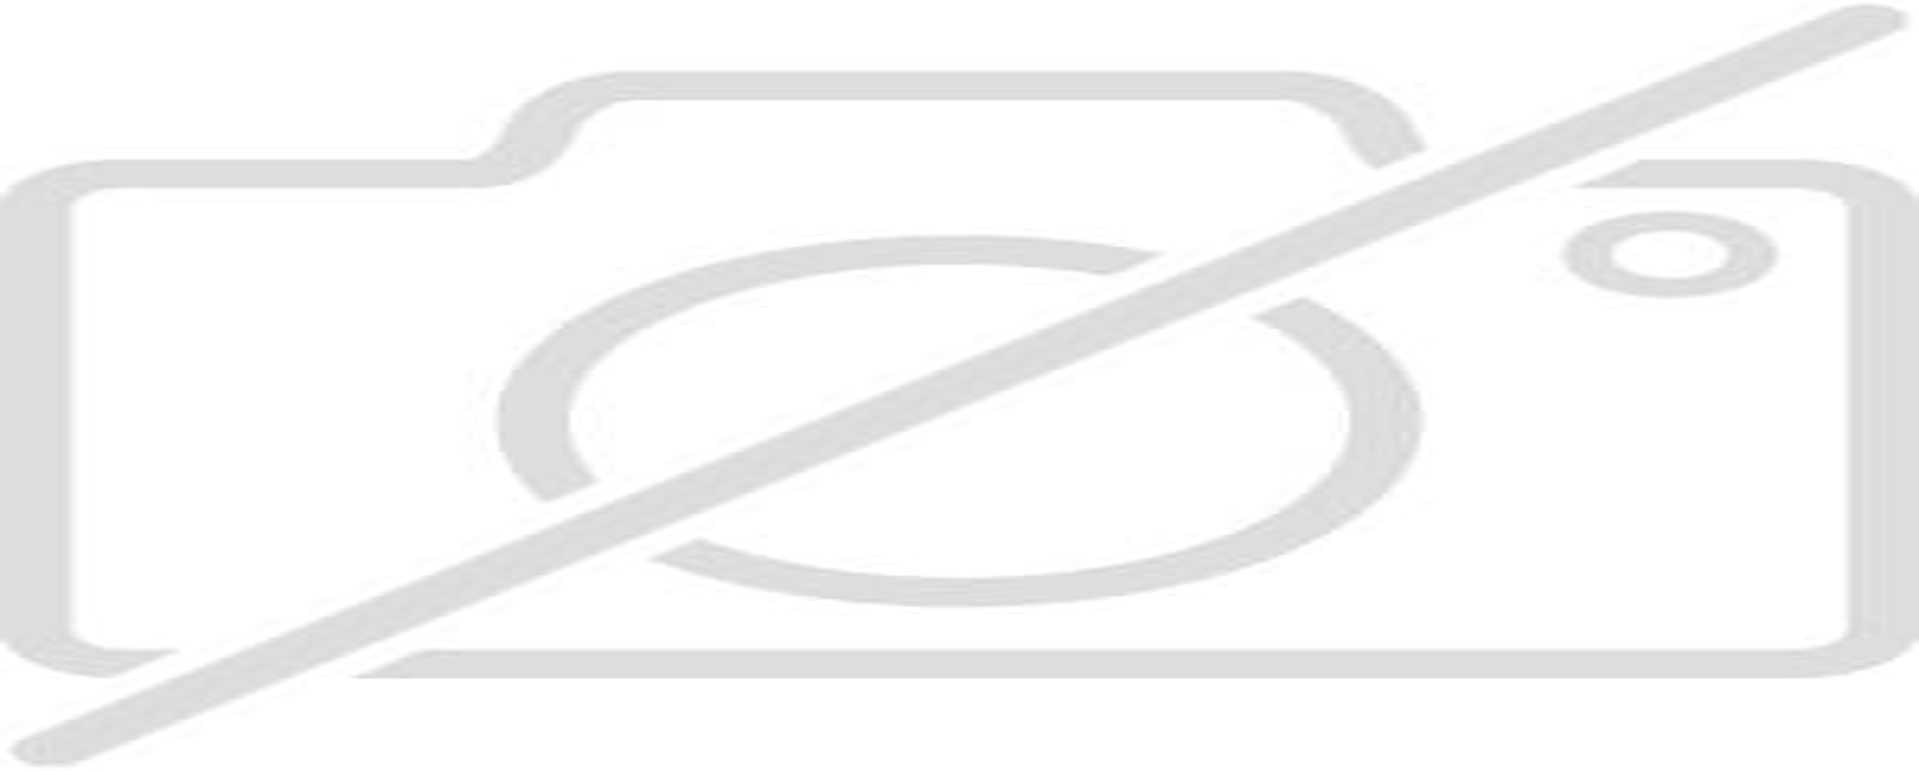 John Doe Titan Revolution Sungglasses